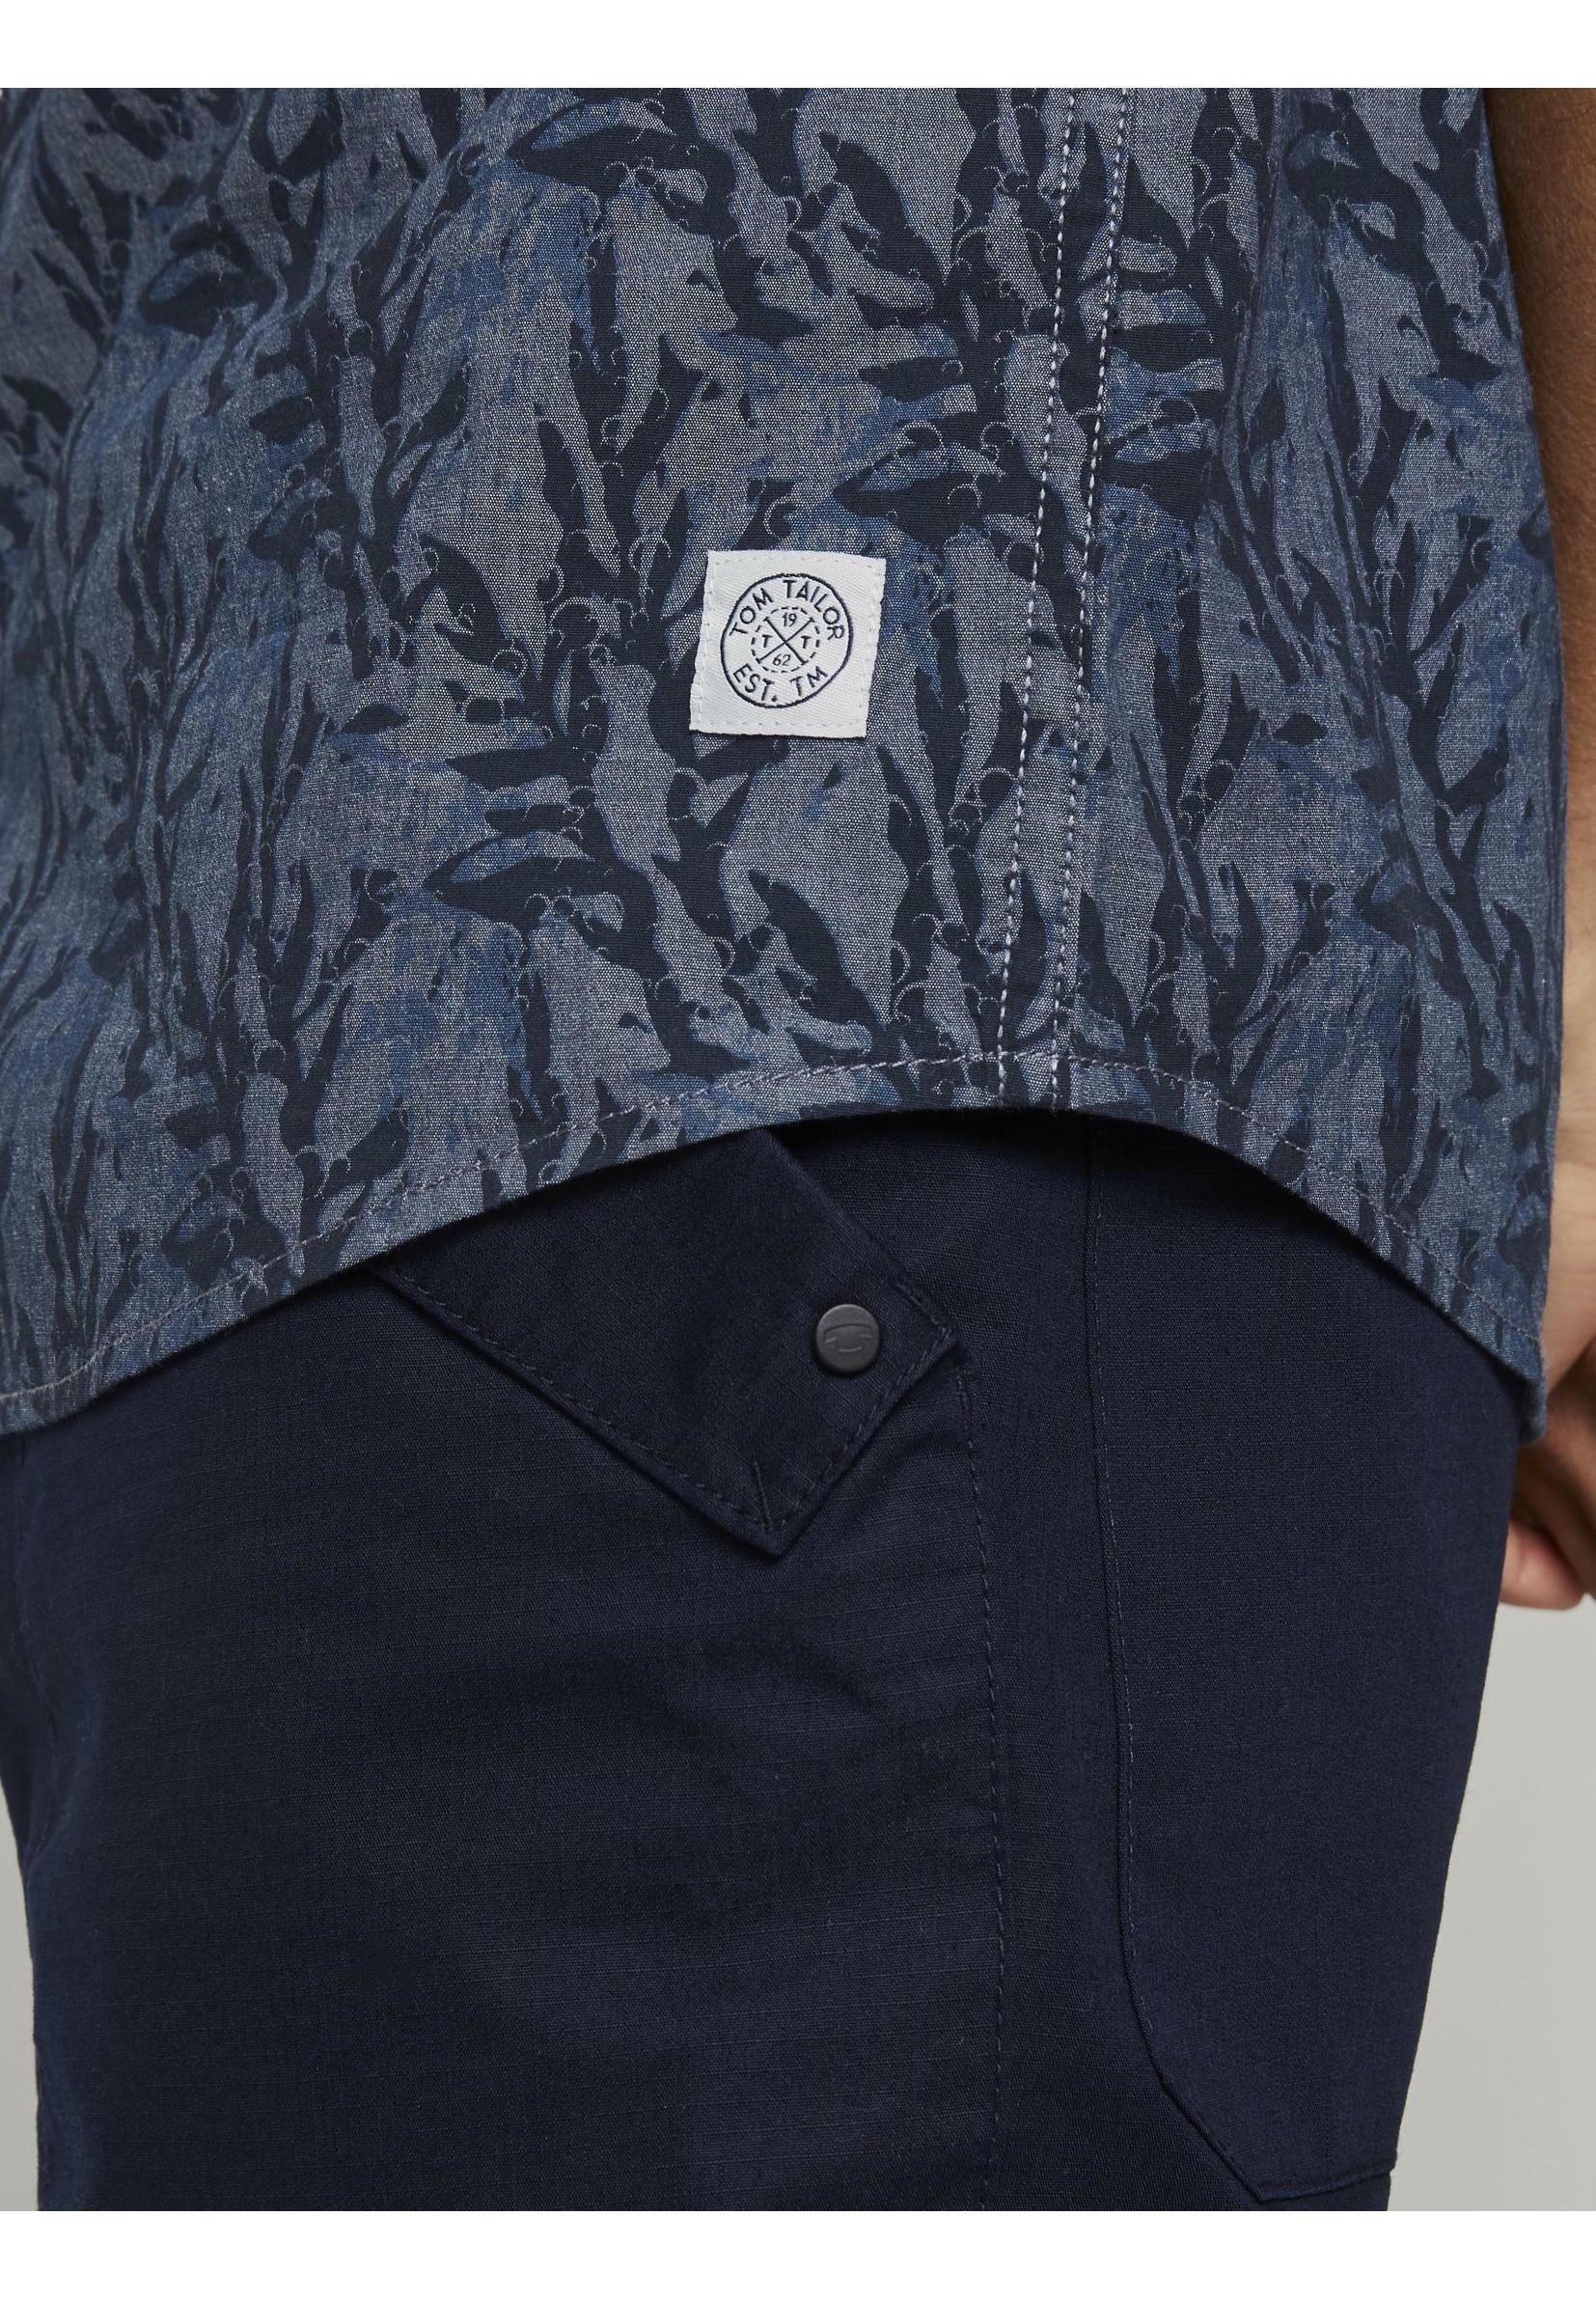 TOM TAILOR Hemd - navy tonal abstact kelp design | Herrenbekleidung 2020